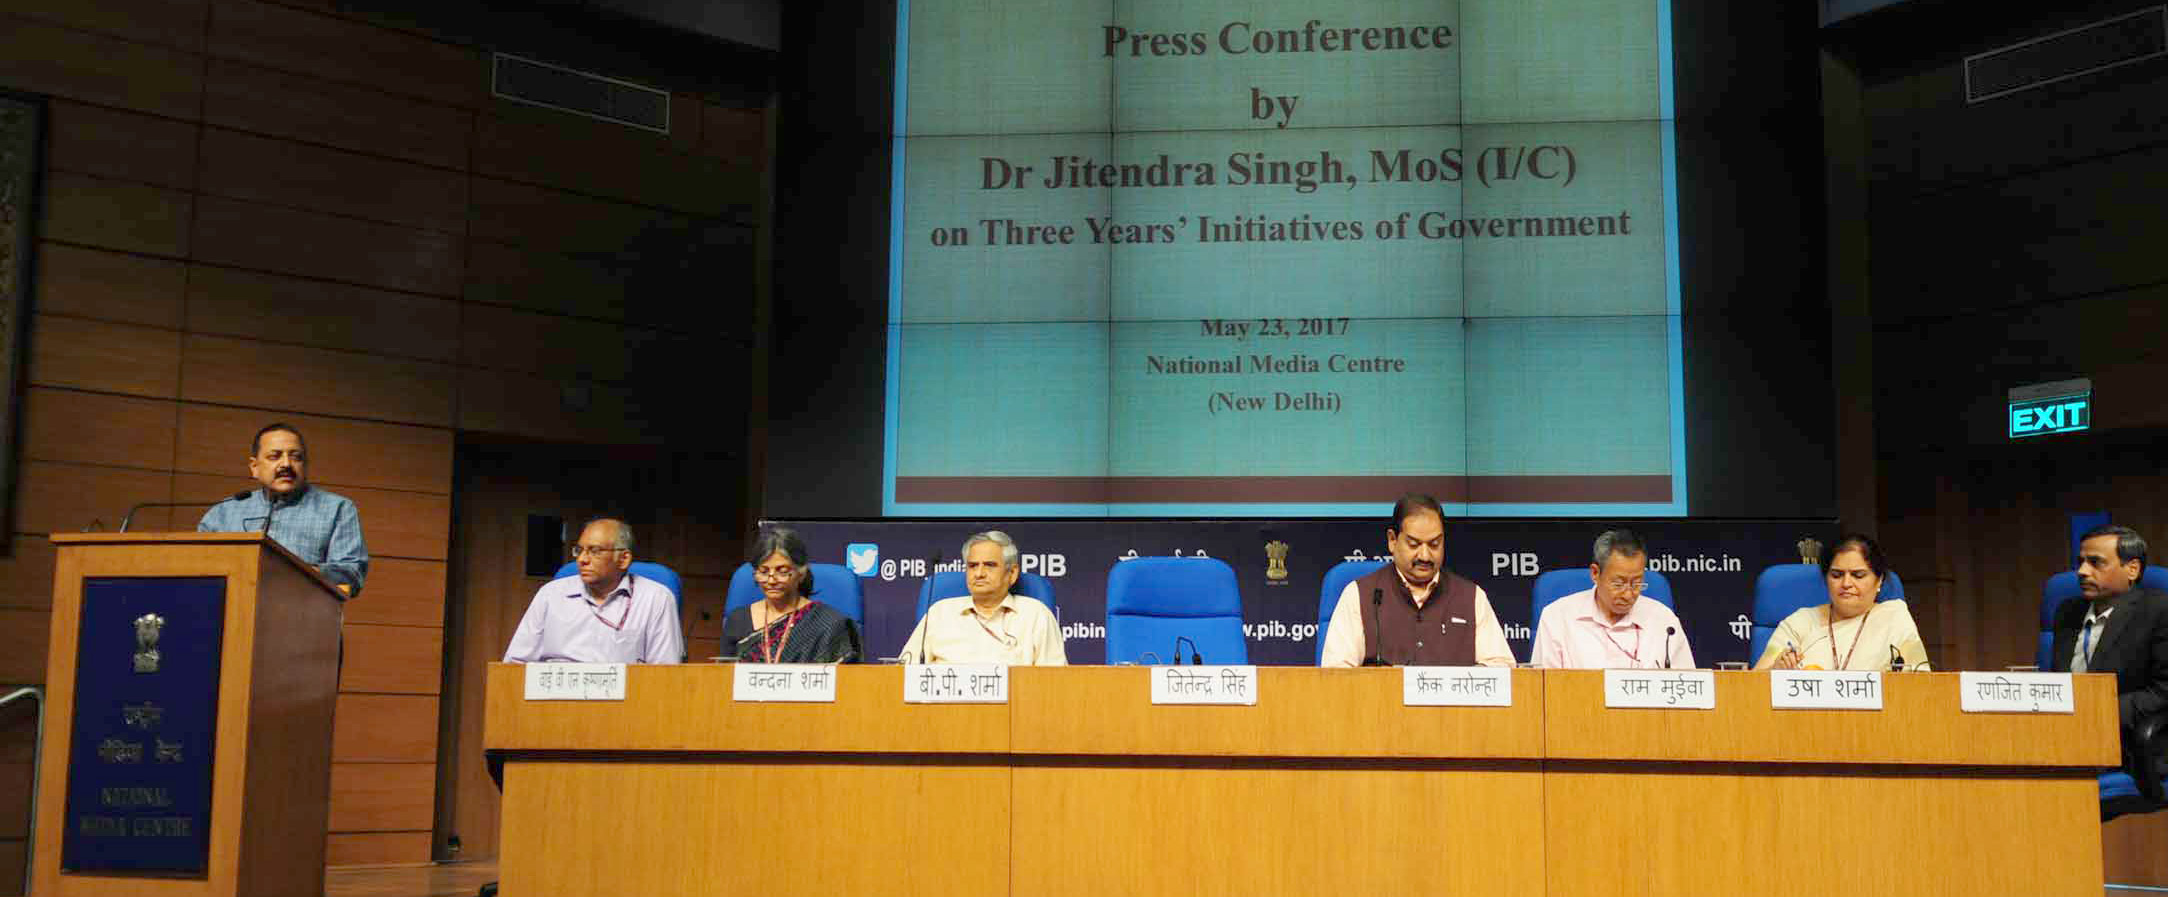 File:Jitendra Singh addressing a press conference on key